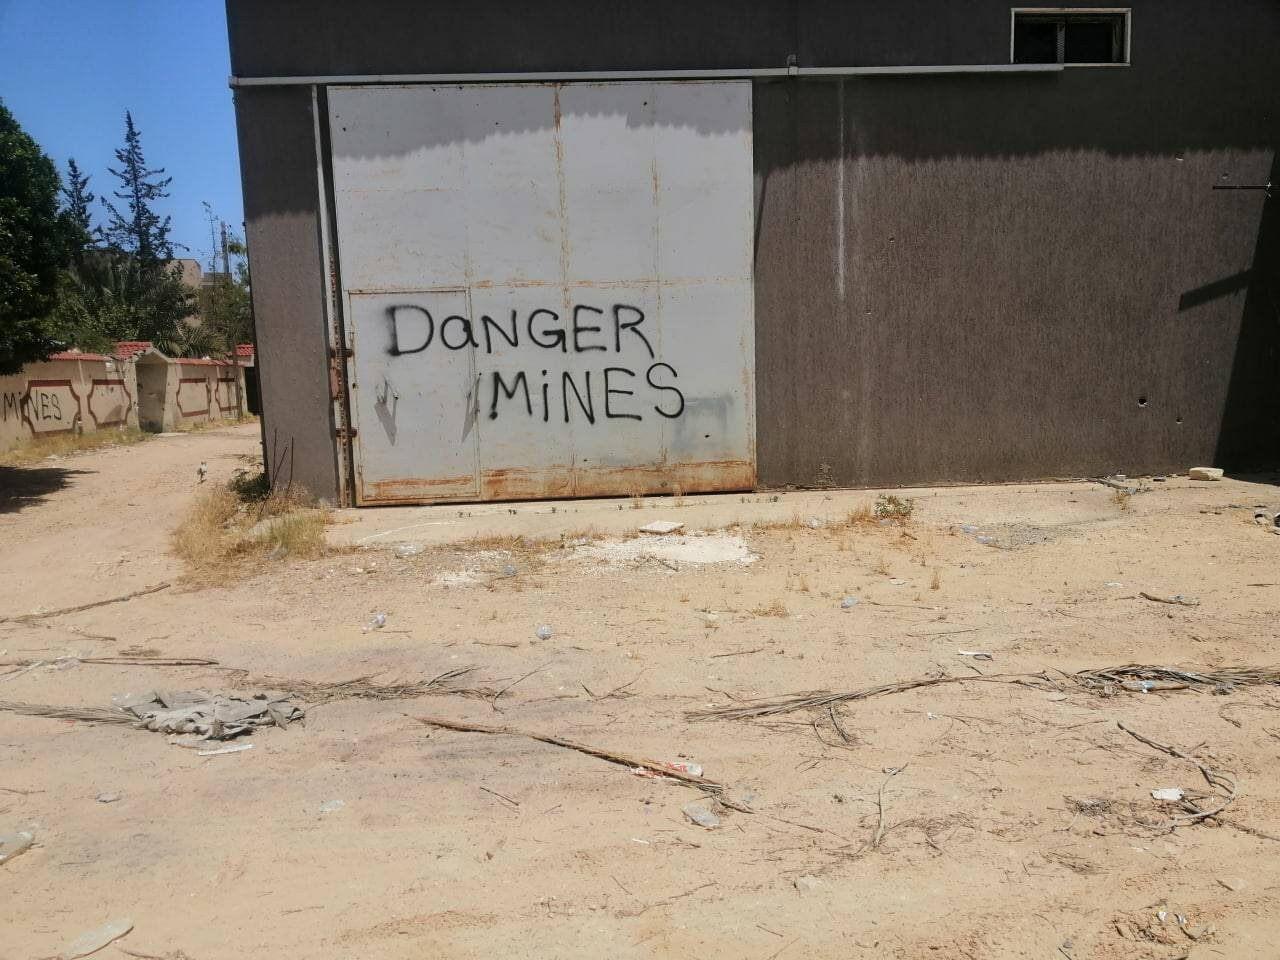 "The message ""Danger mines"" sprayed on a door"